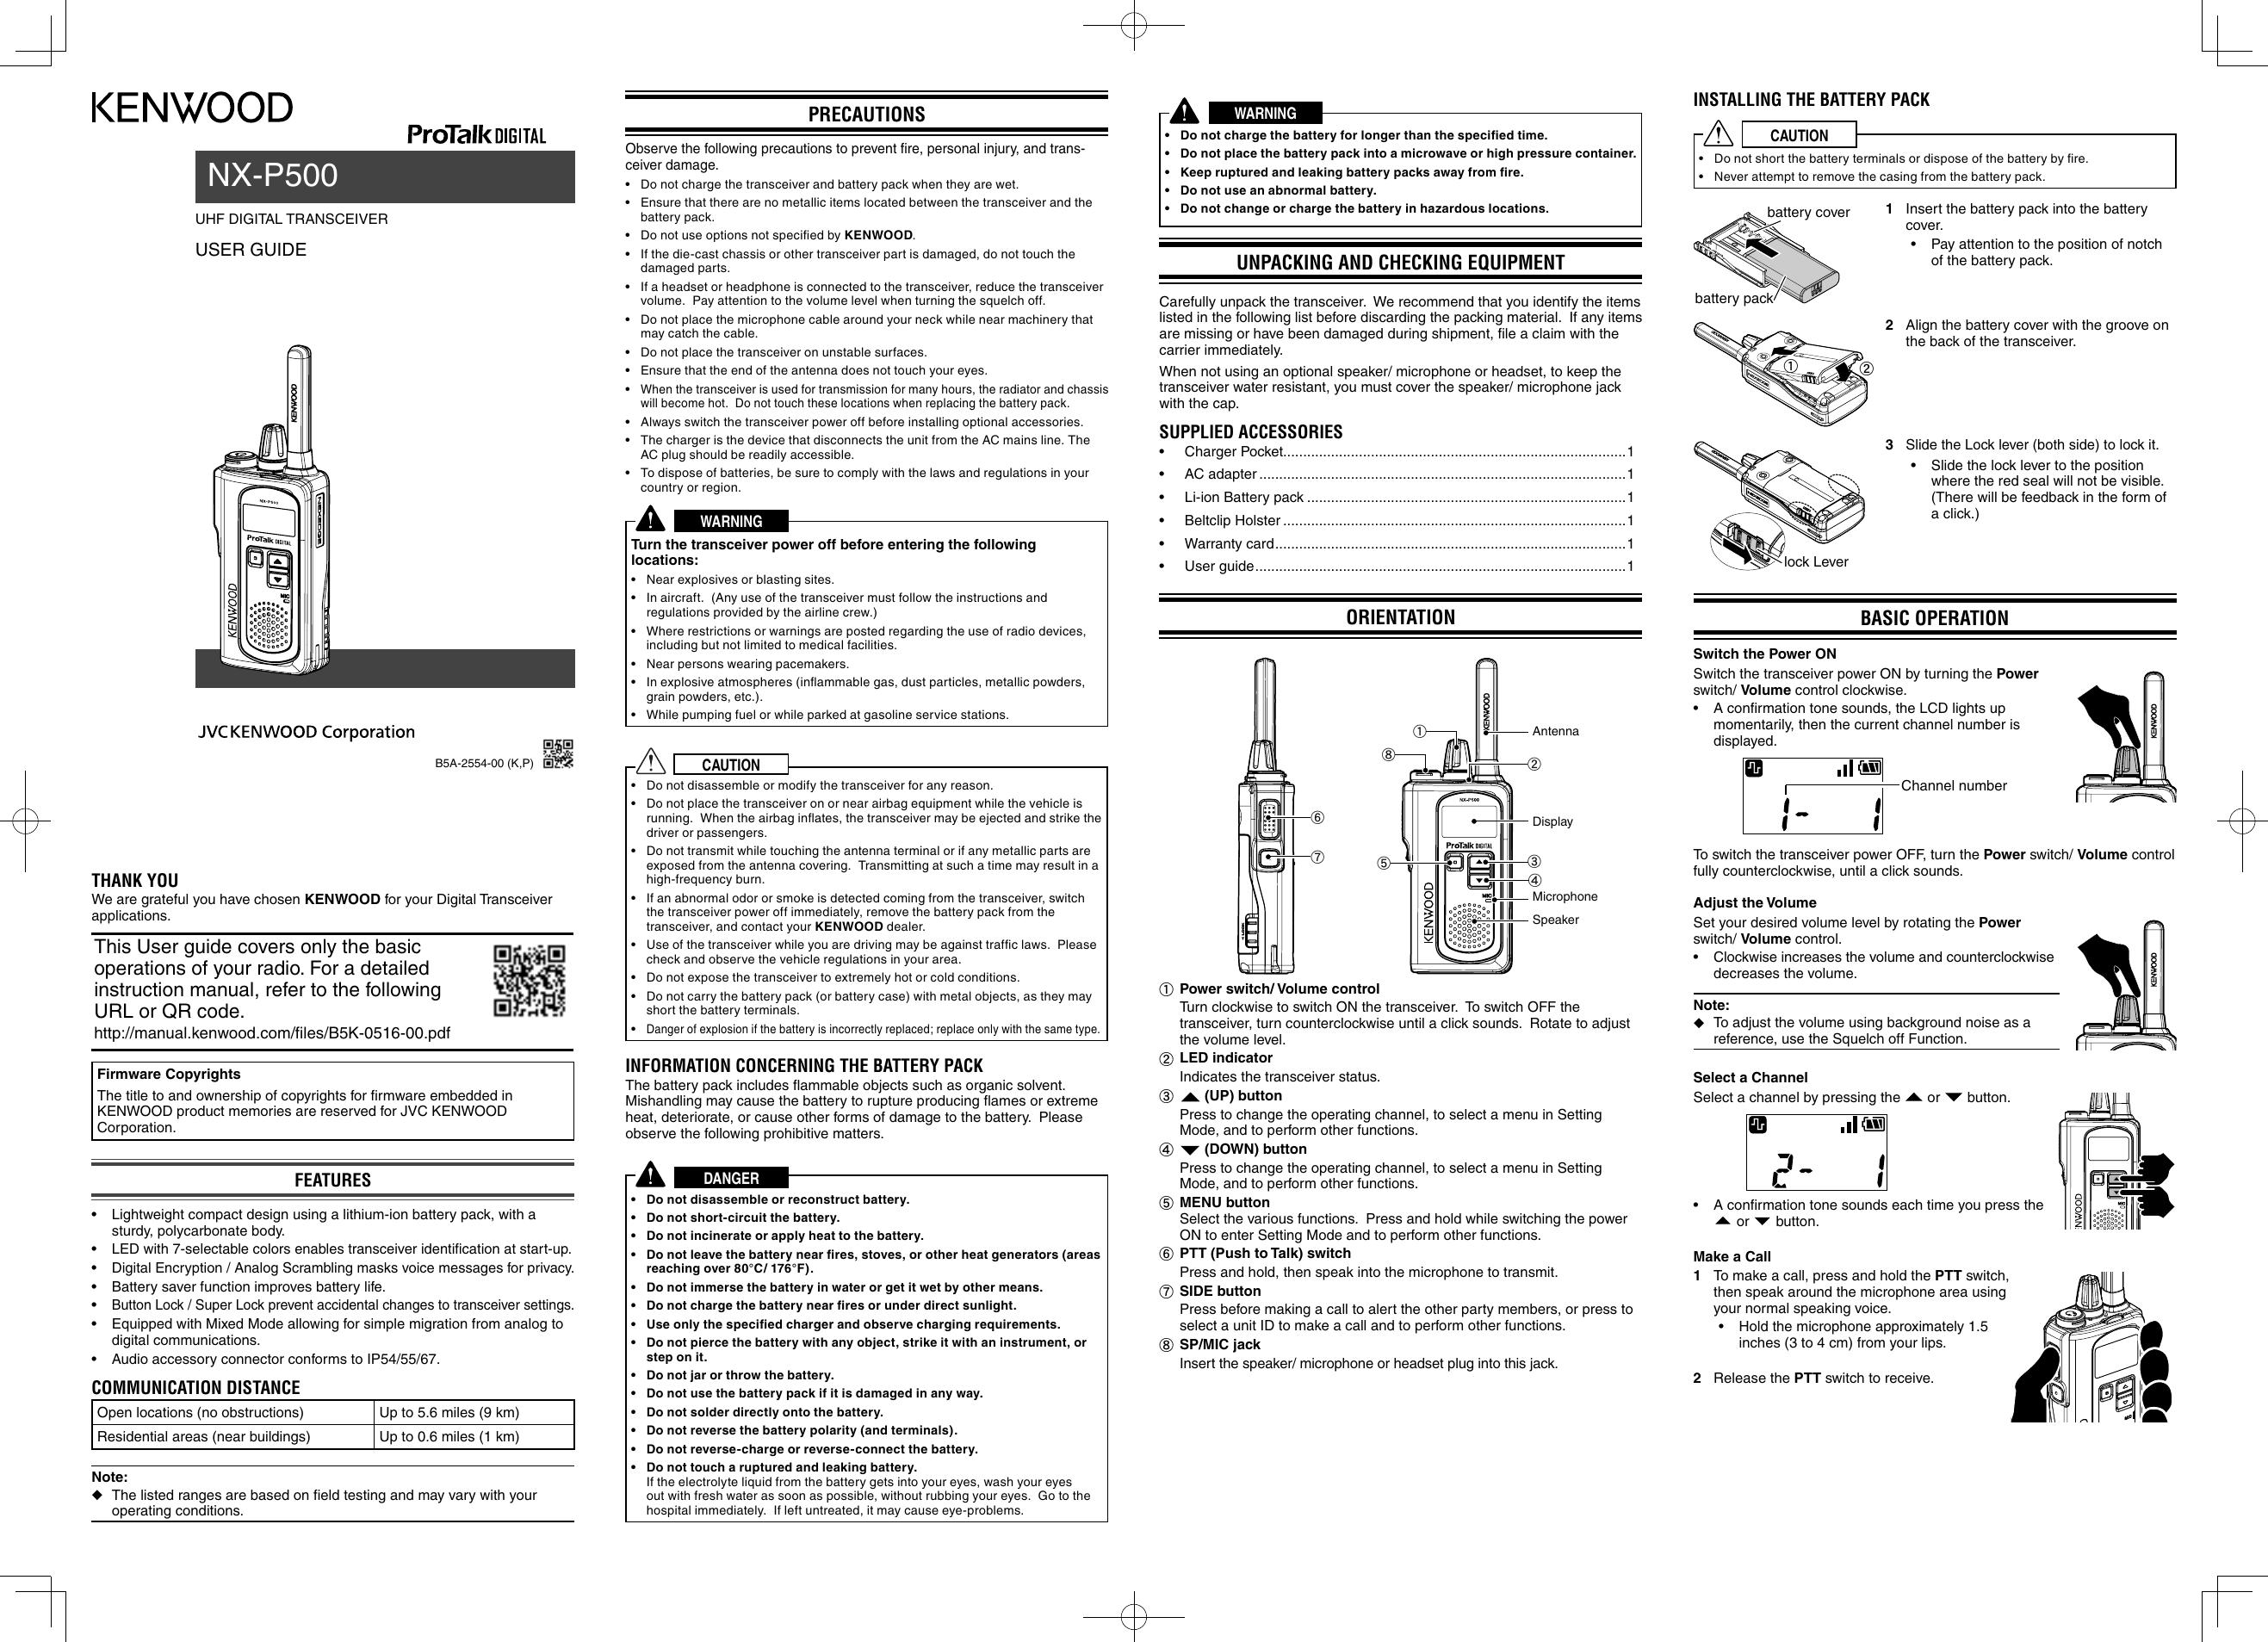 Jvc kenwood 500000 uhf digital transceiver user manual nx p500.